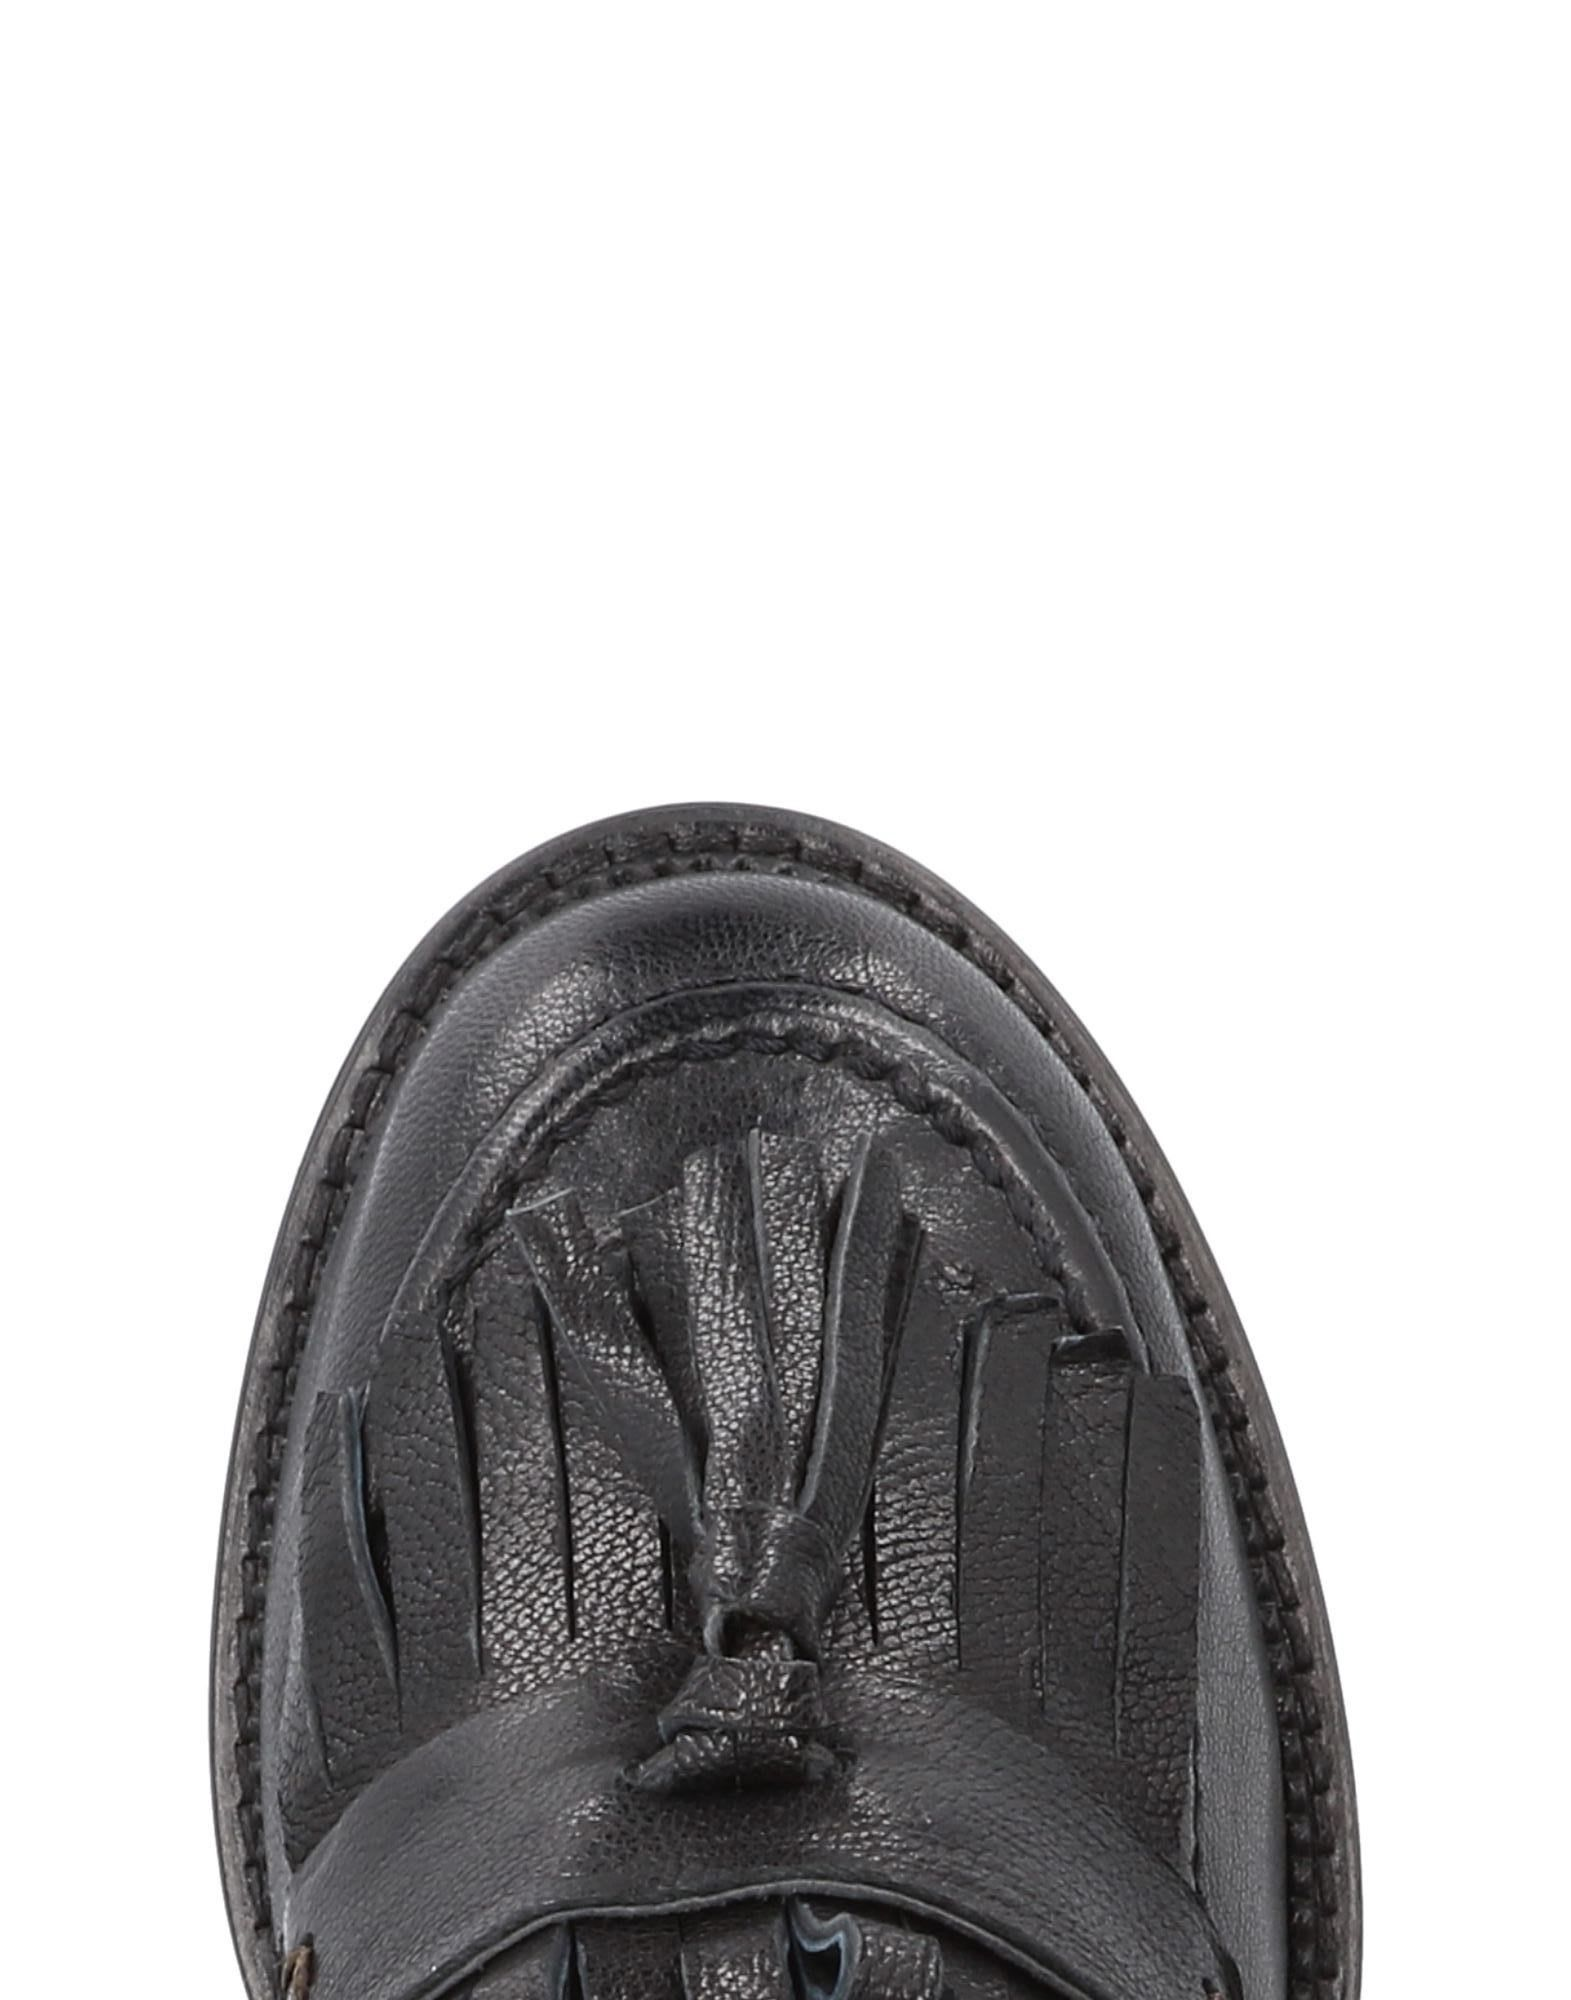 Tangerine Gute Mokassins Damen  11473227WL Gute Tangerine Qualität beliebte Schuhe 7f07e3